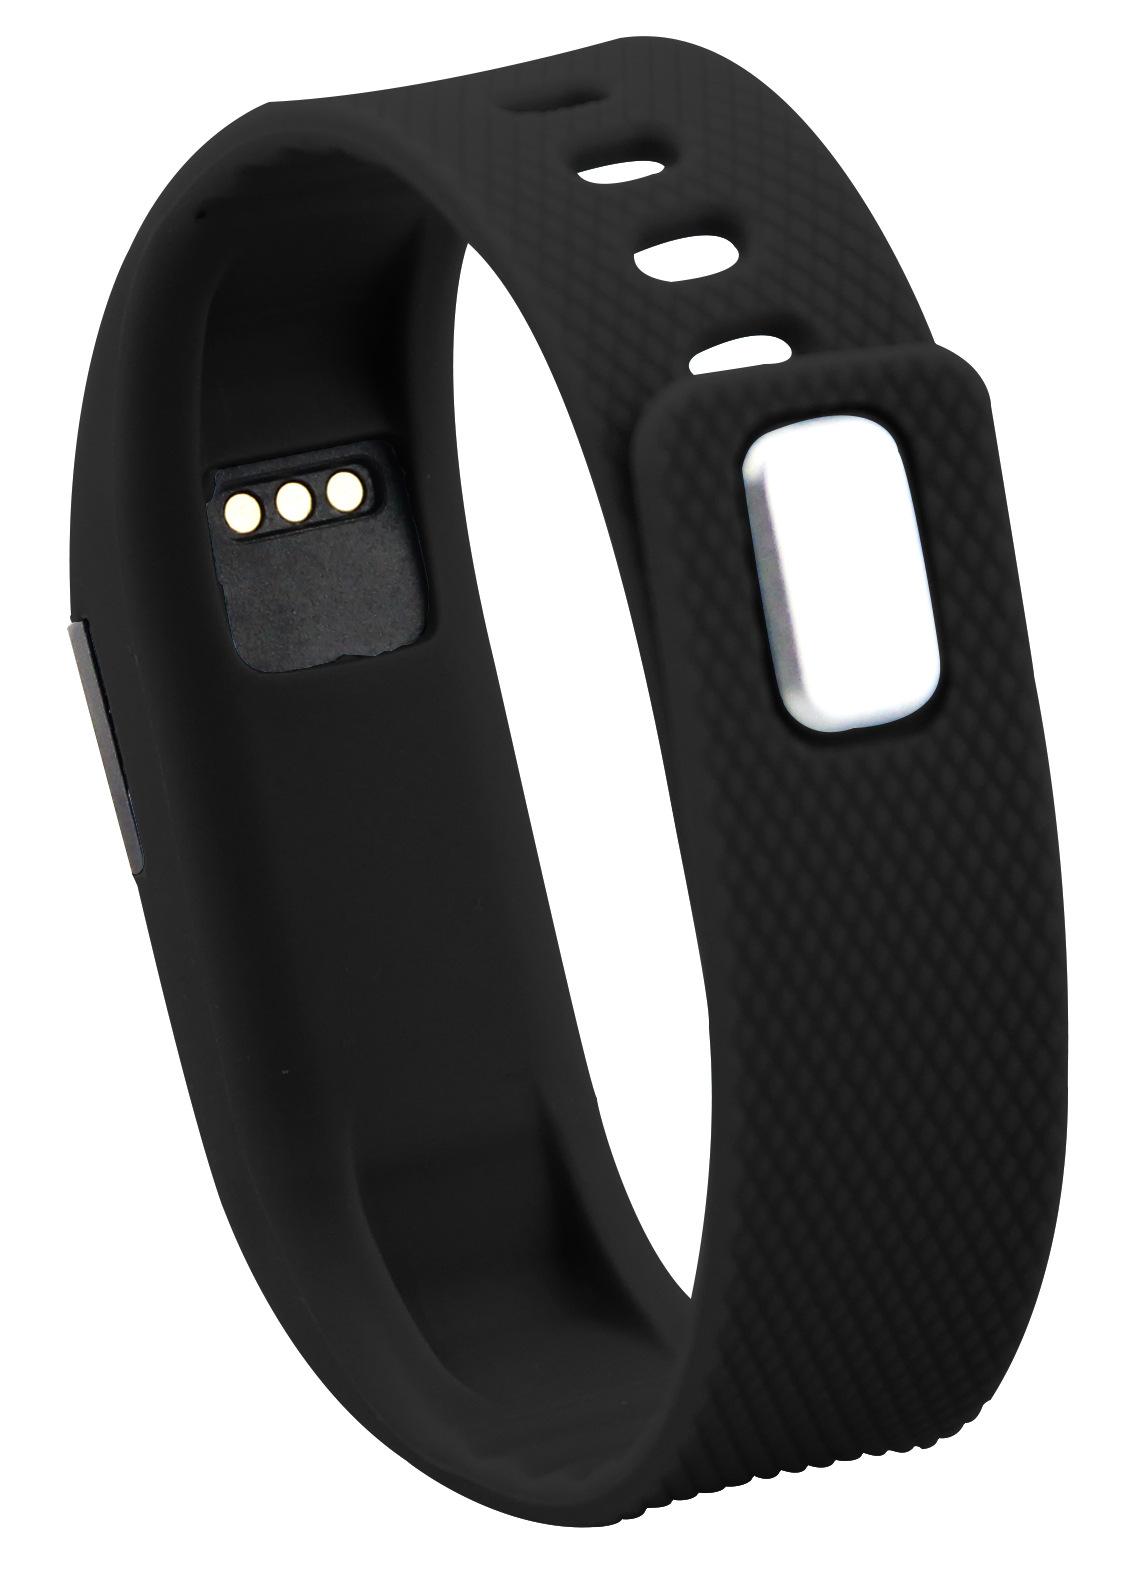 2015 top selling smart watch New Bluetooth 4.0 Smart Watch aluminum belt pedometer(China (Mainland))